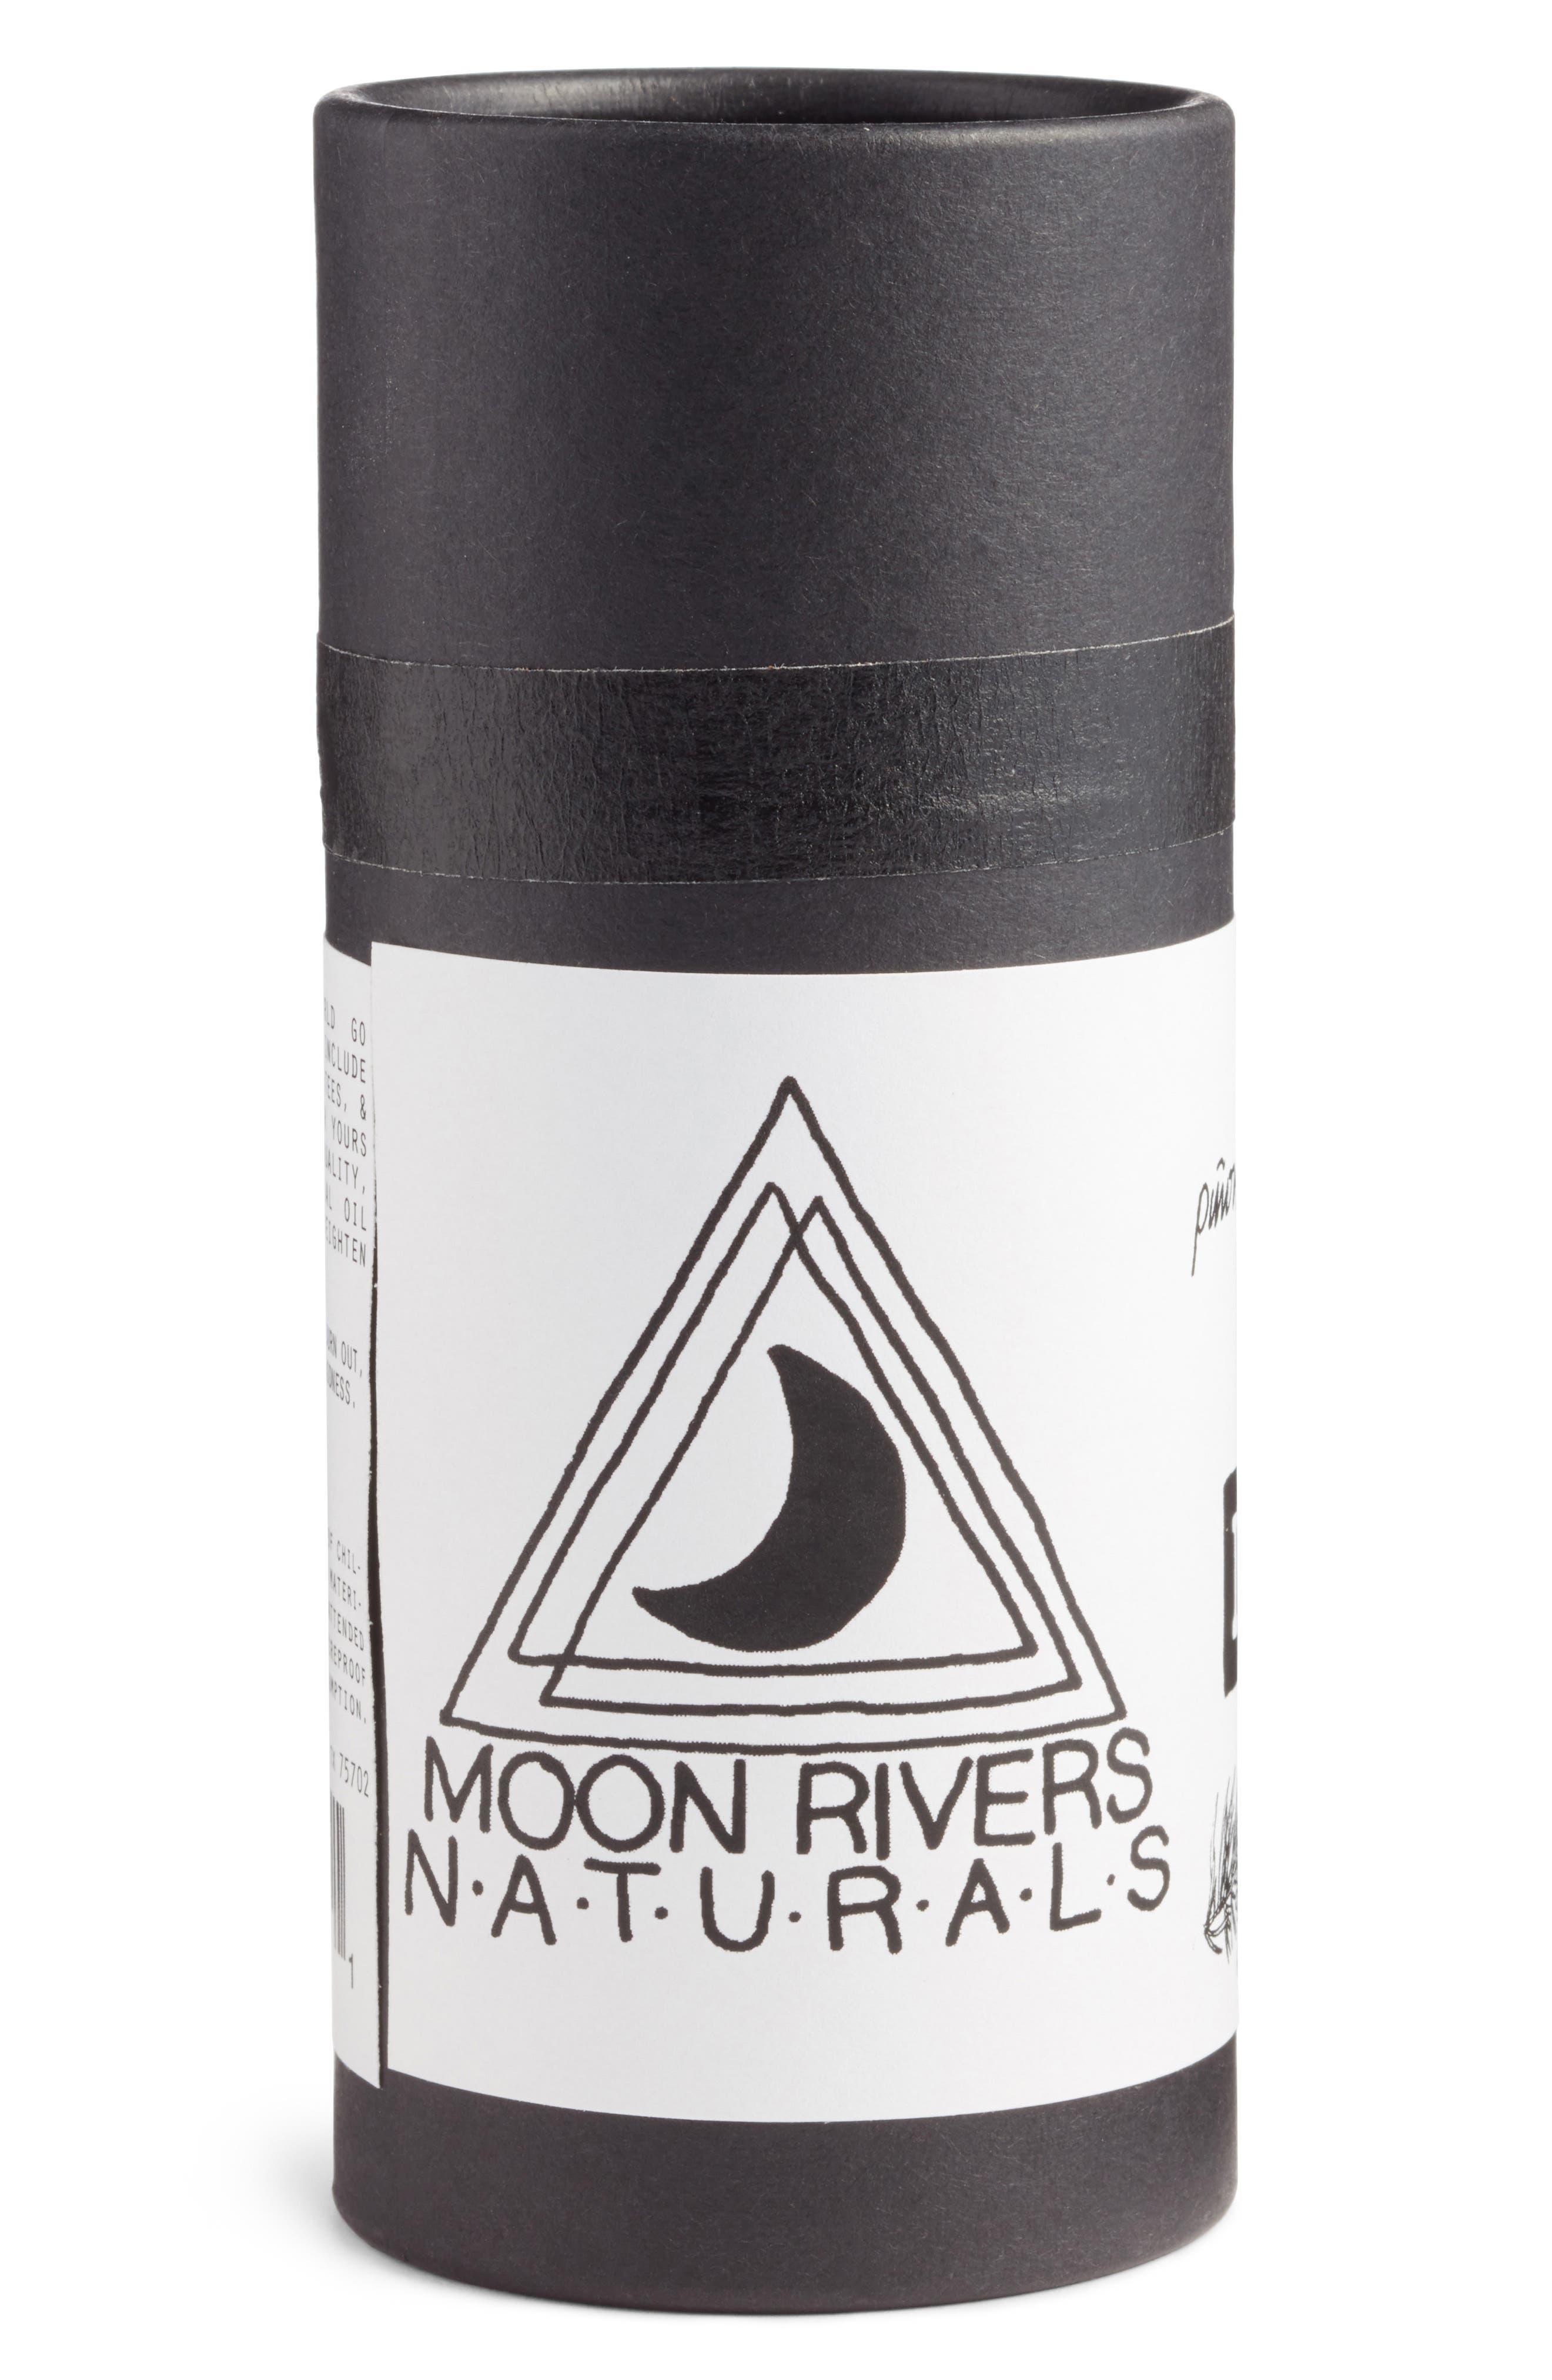 Alternate Image 1 Selected - Moon Rivers Naturals Piñon, Eucalyptus & Lemongrass Incense